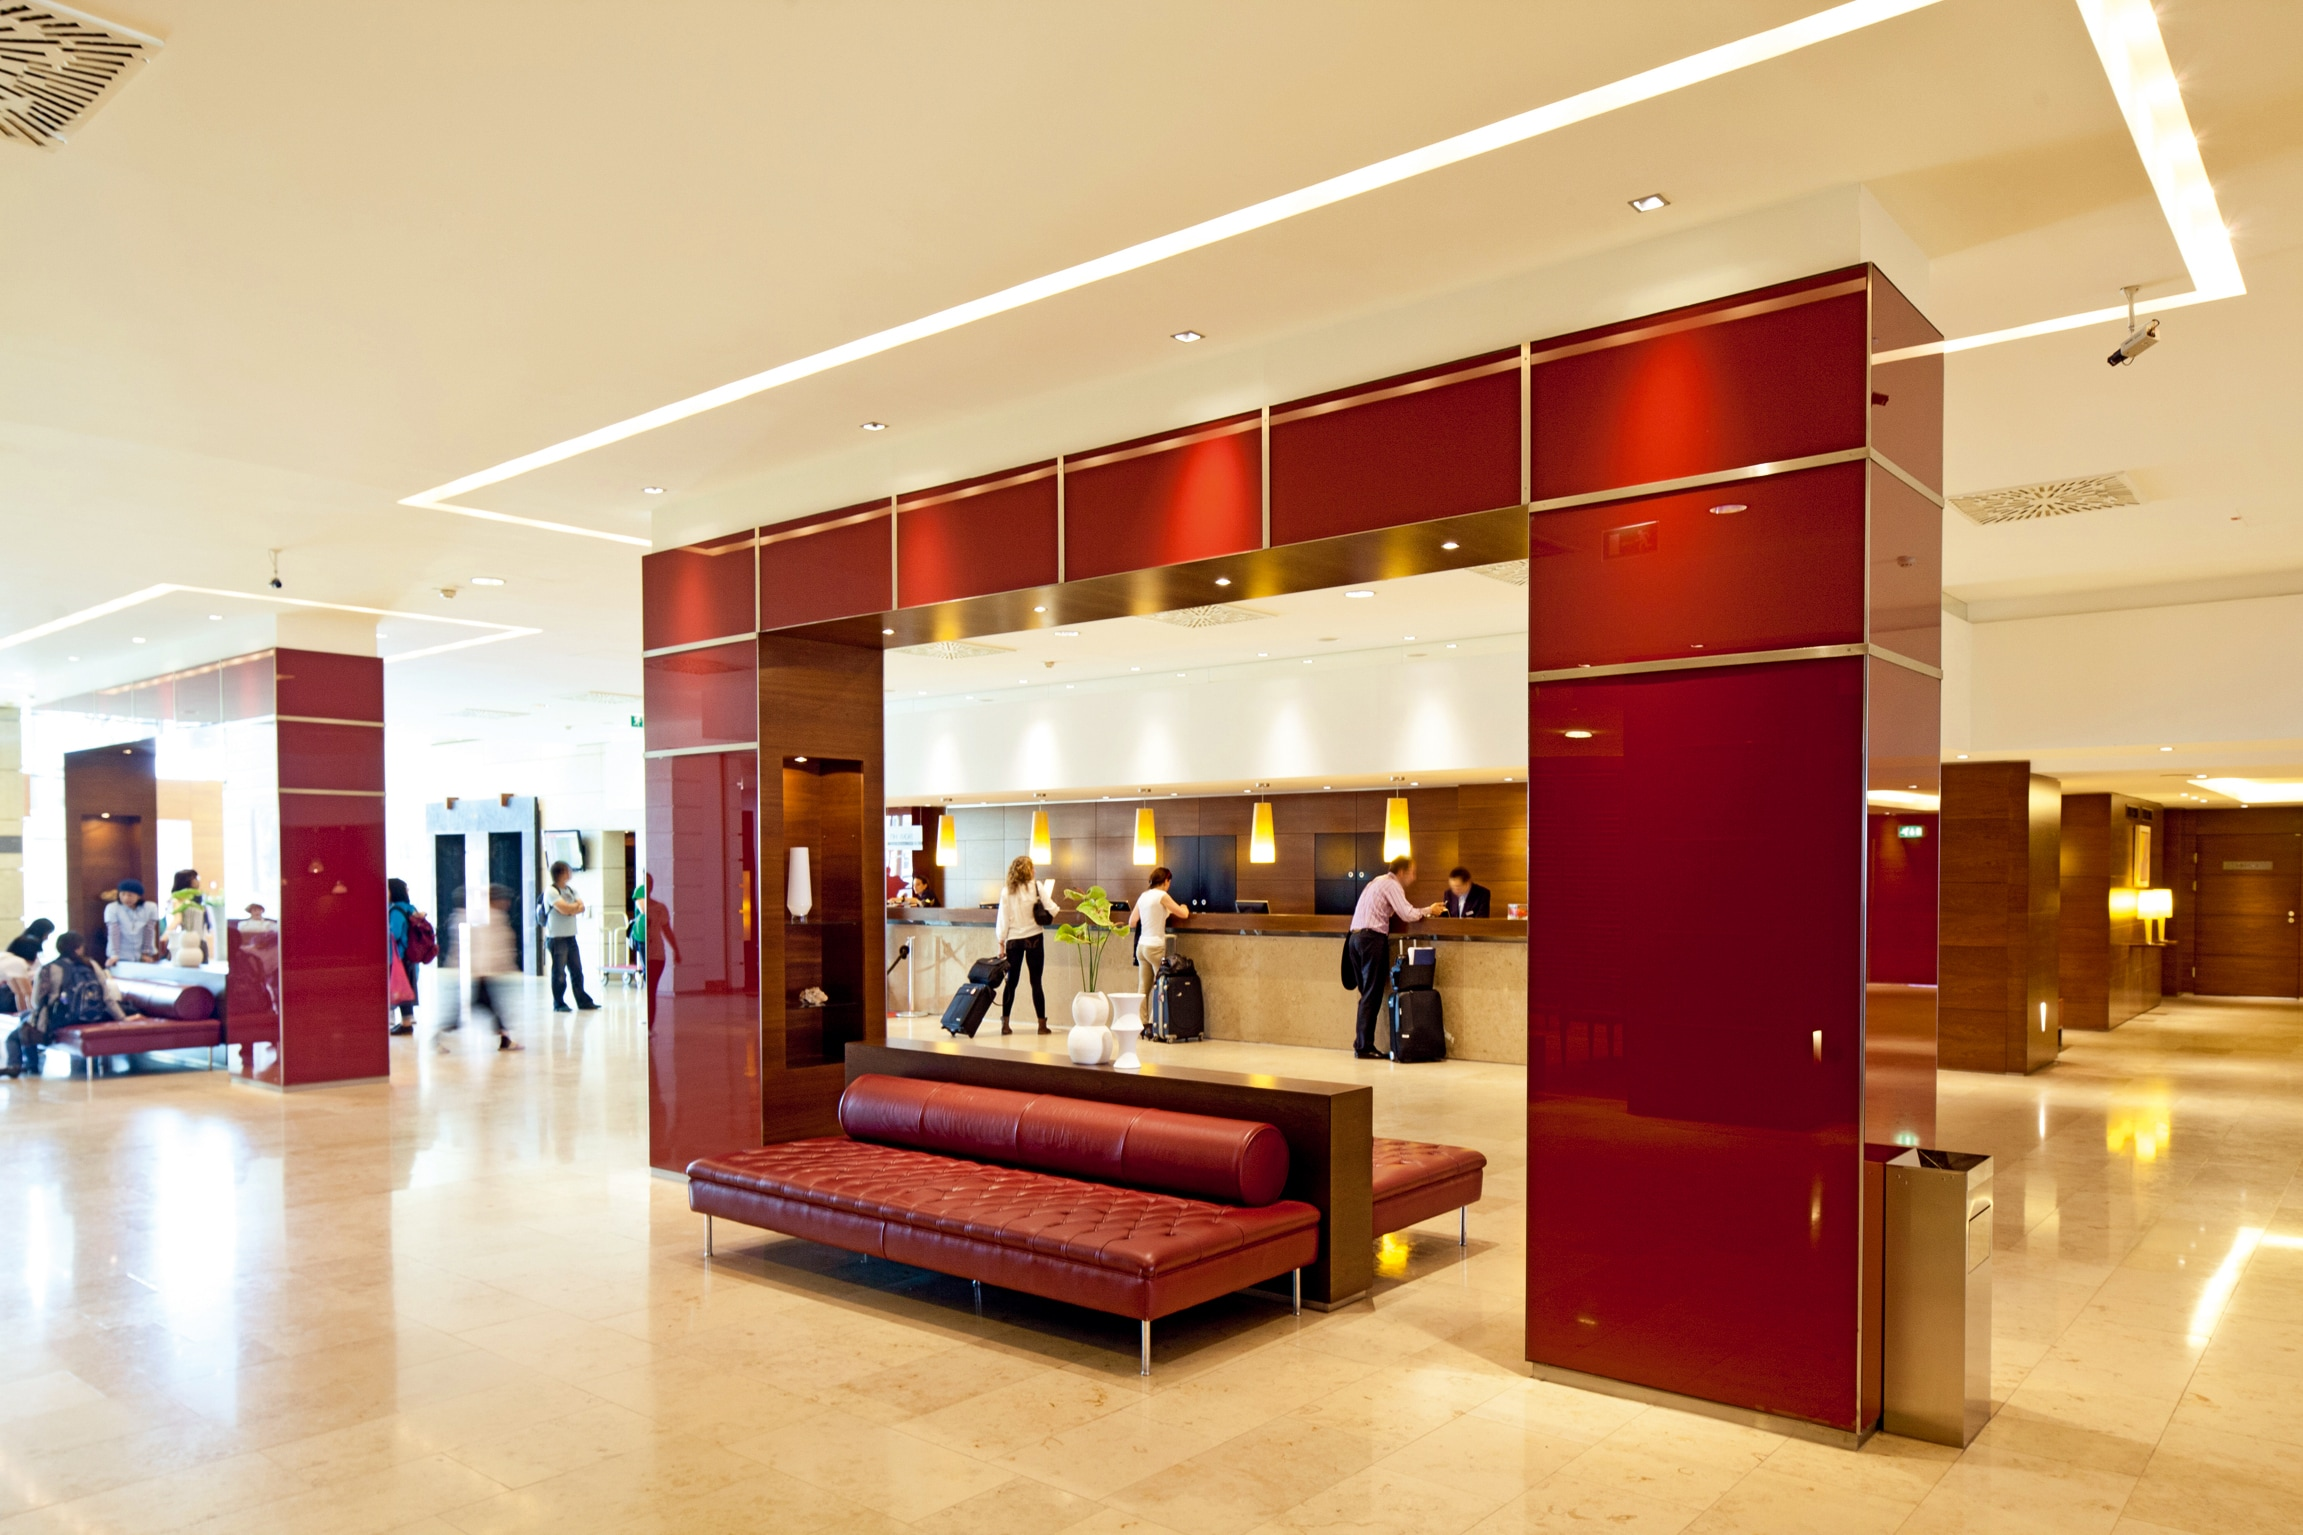 philips master led lampen f r nh hoteles. Black Bedroom Furniture Sets. Home Design Ideas